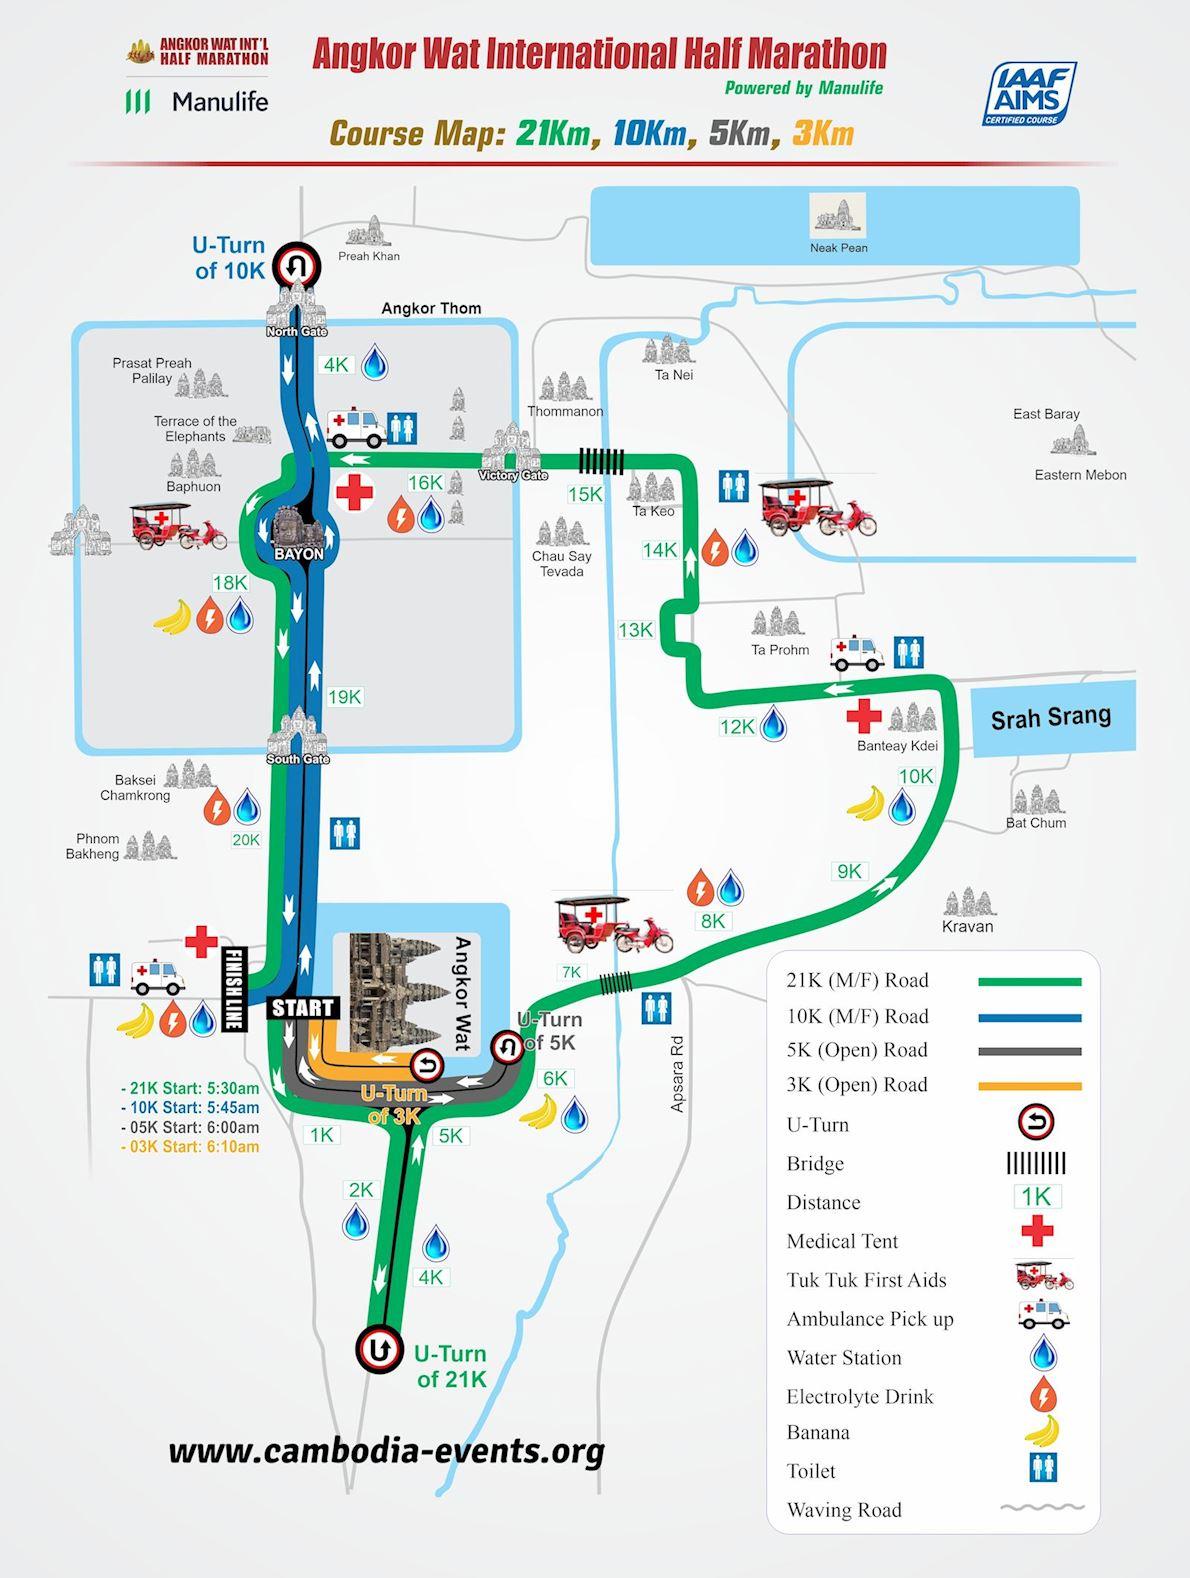 Angkor Wat Map Angkor Wat International Half Marathon, Dec 08 2019 Angkor Wat Map